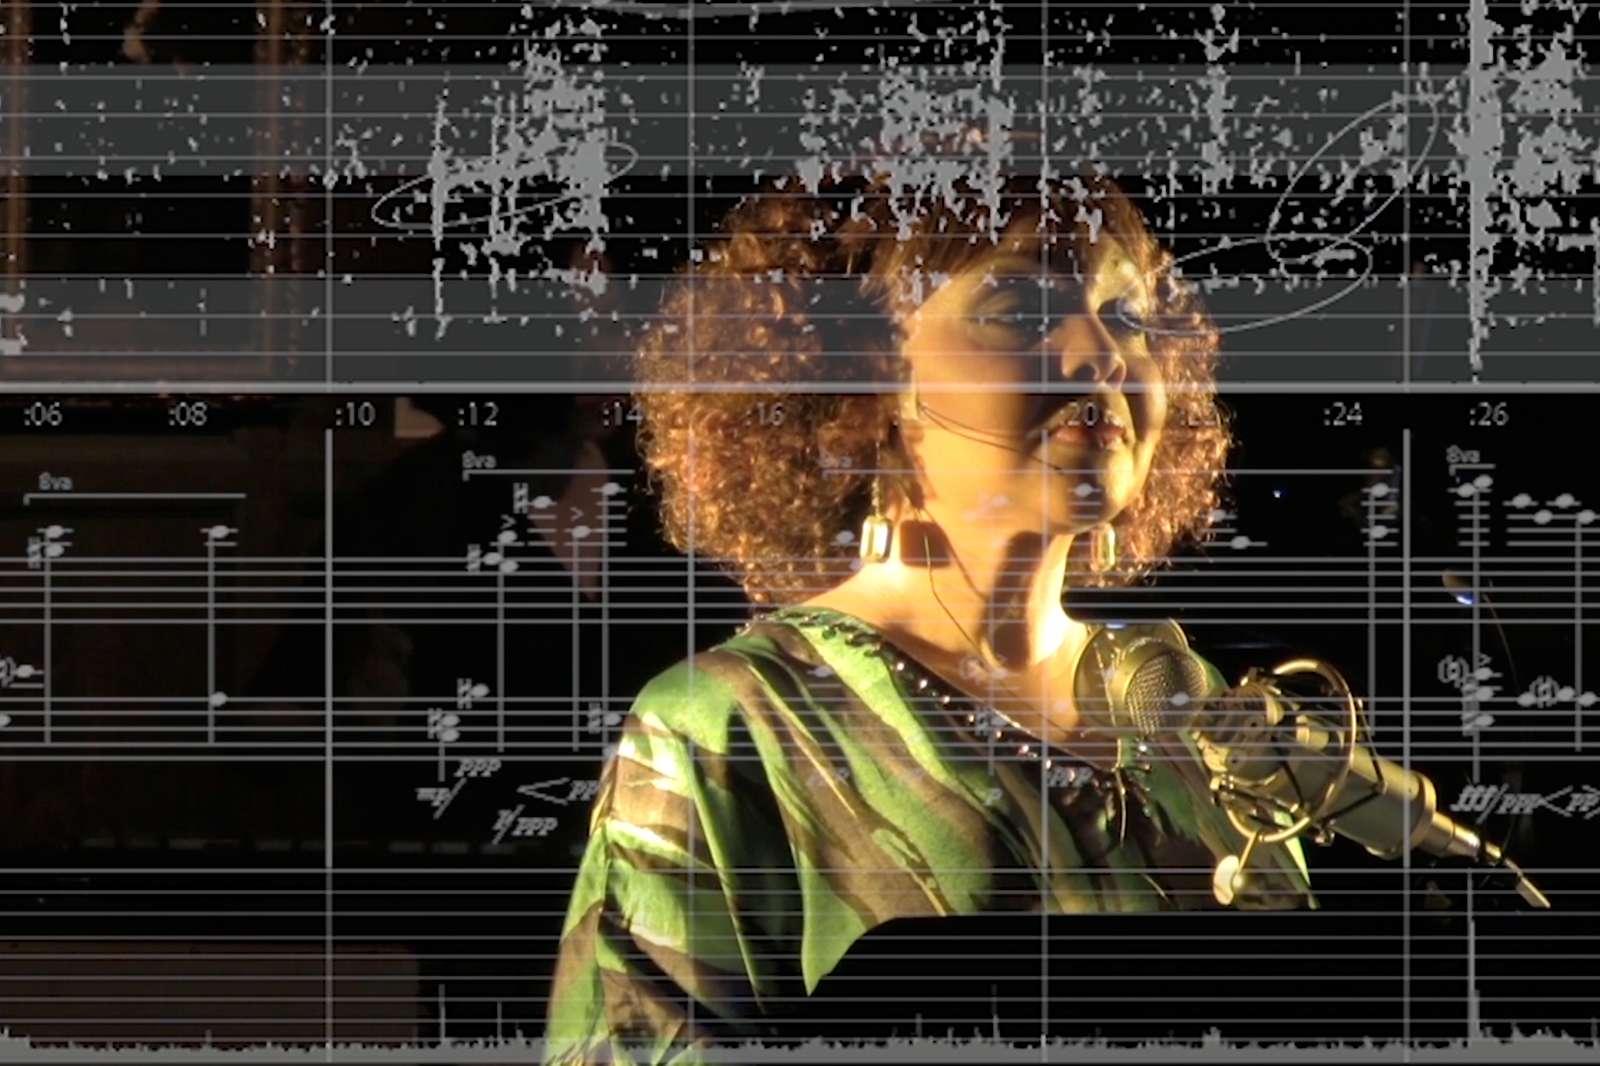 Lisa Edwards-Burrs performsAuksalaq, score excerpt by Matthew Burtner. Photo by Joe Adkins